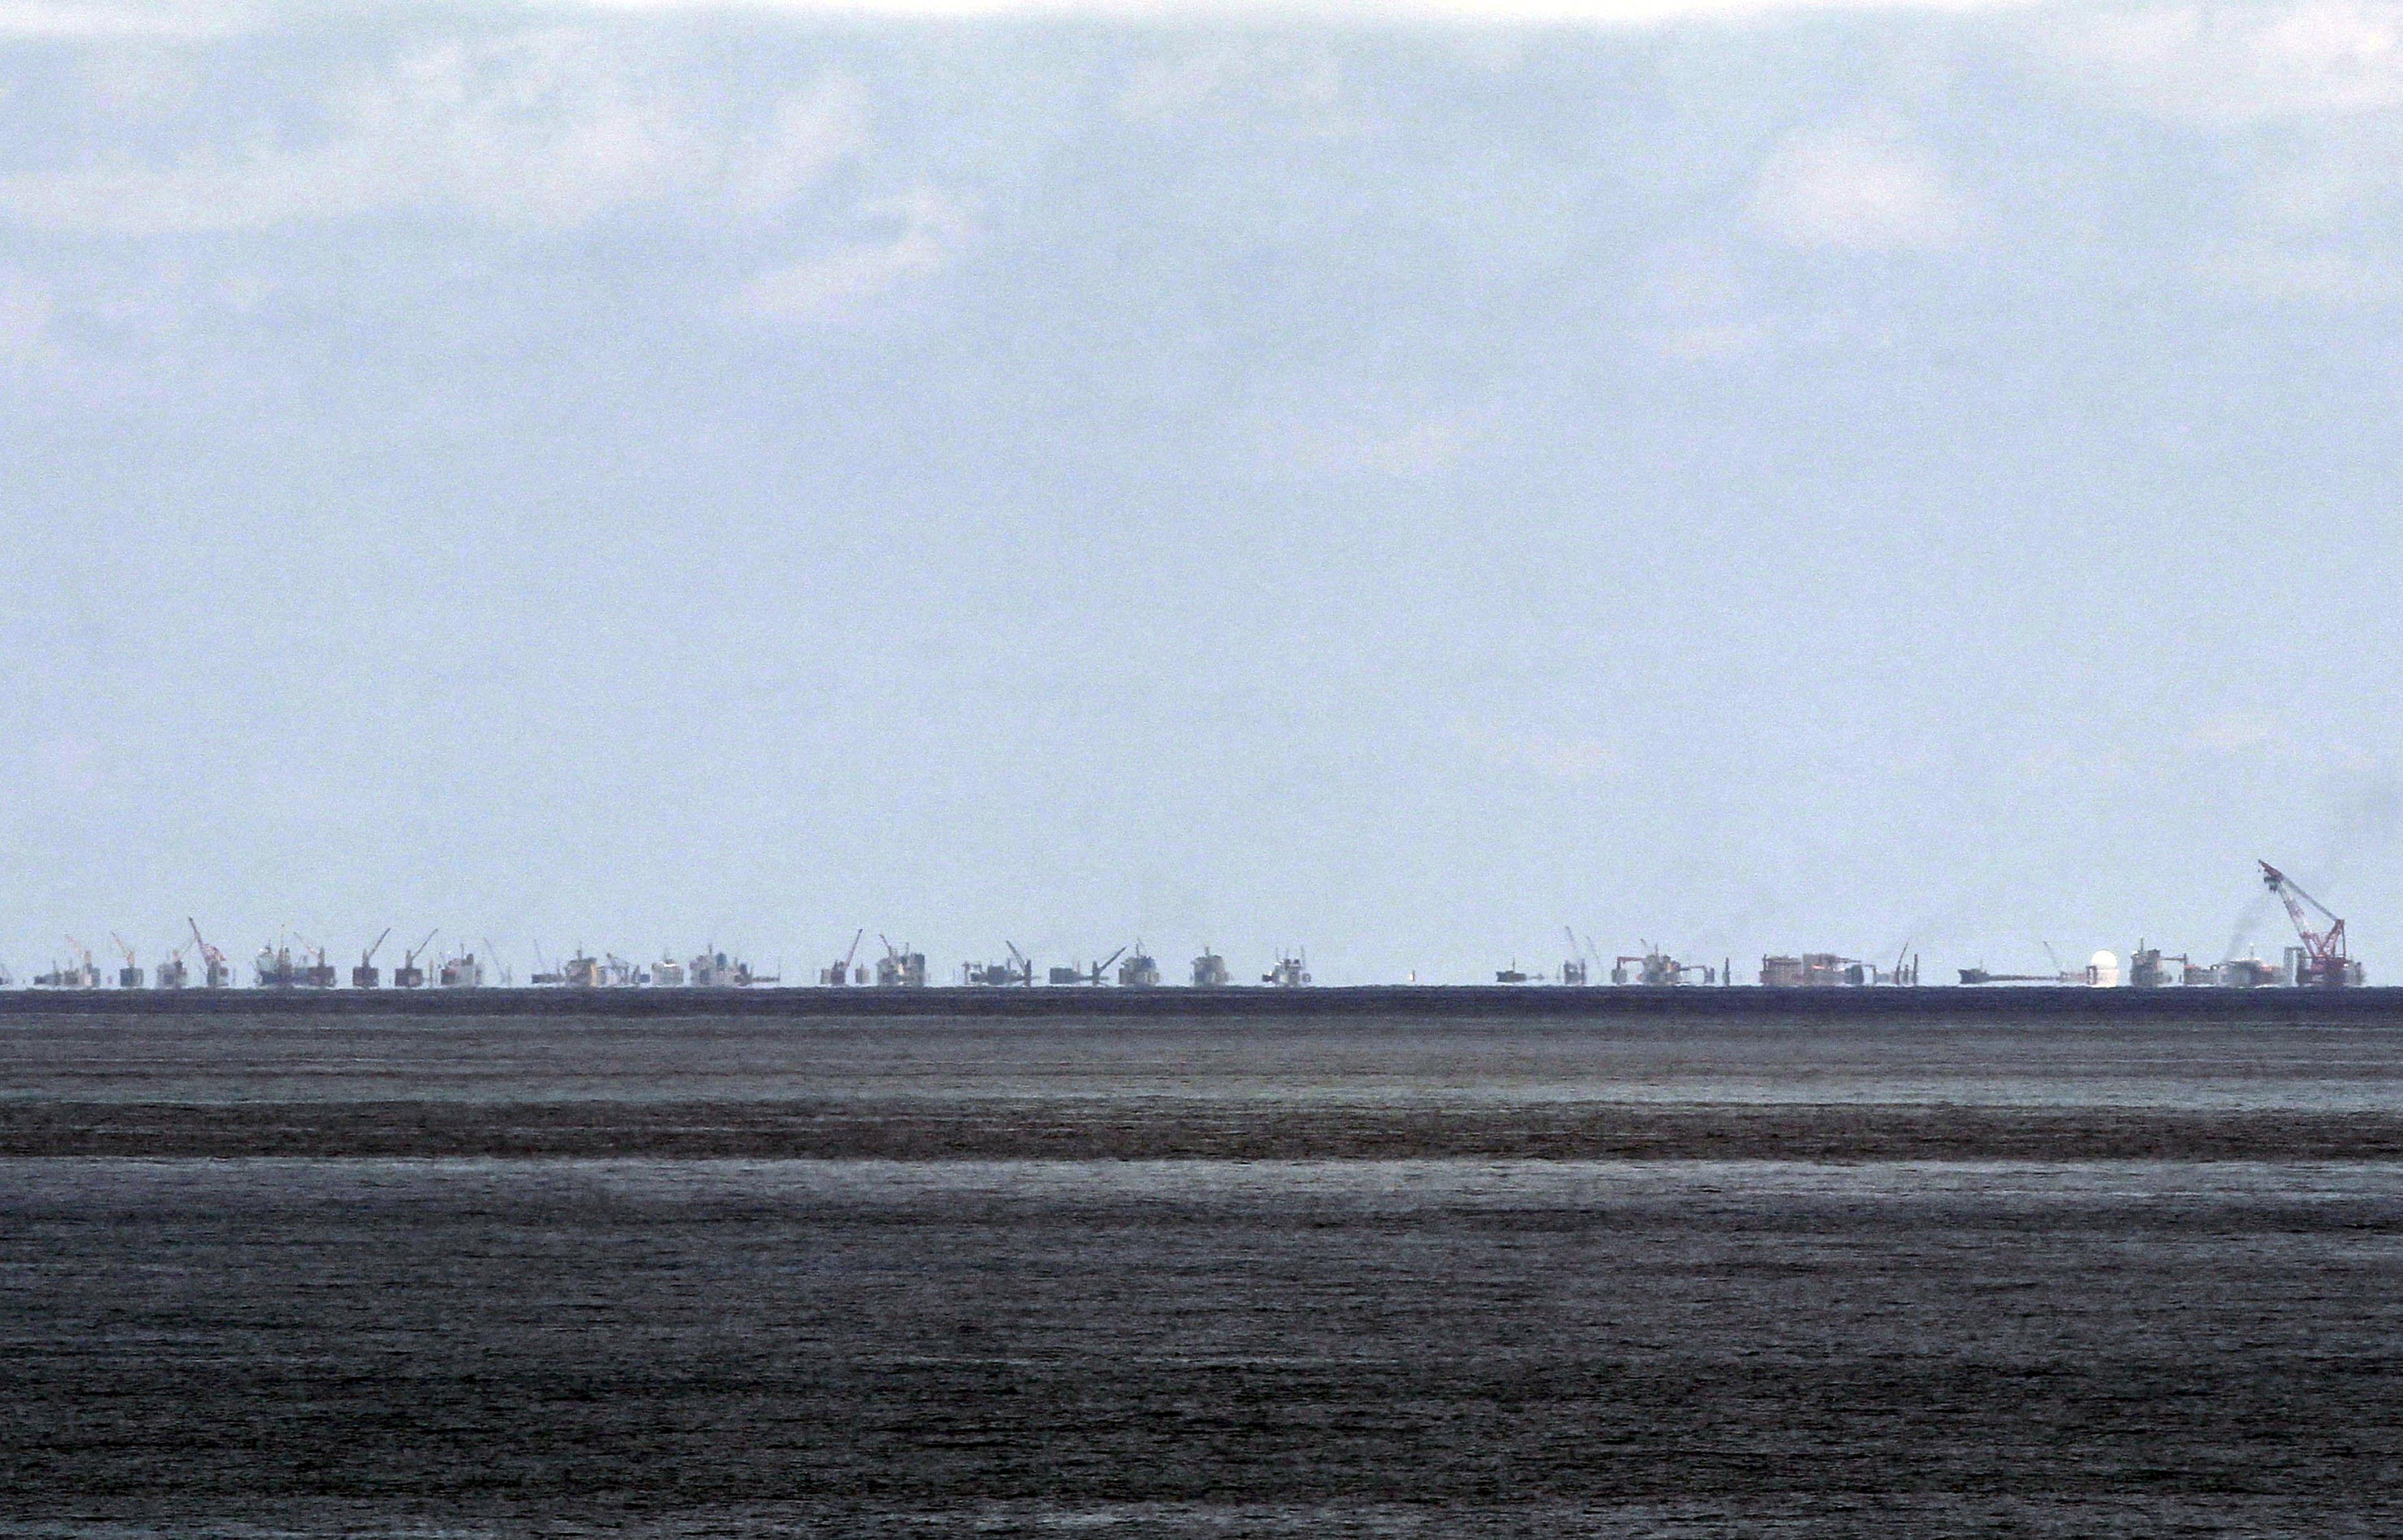 China says U.S. East Vietnam Sea actions